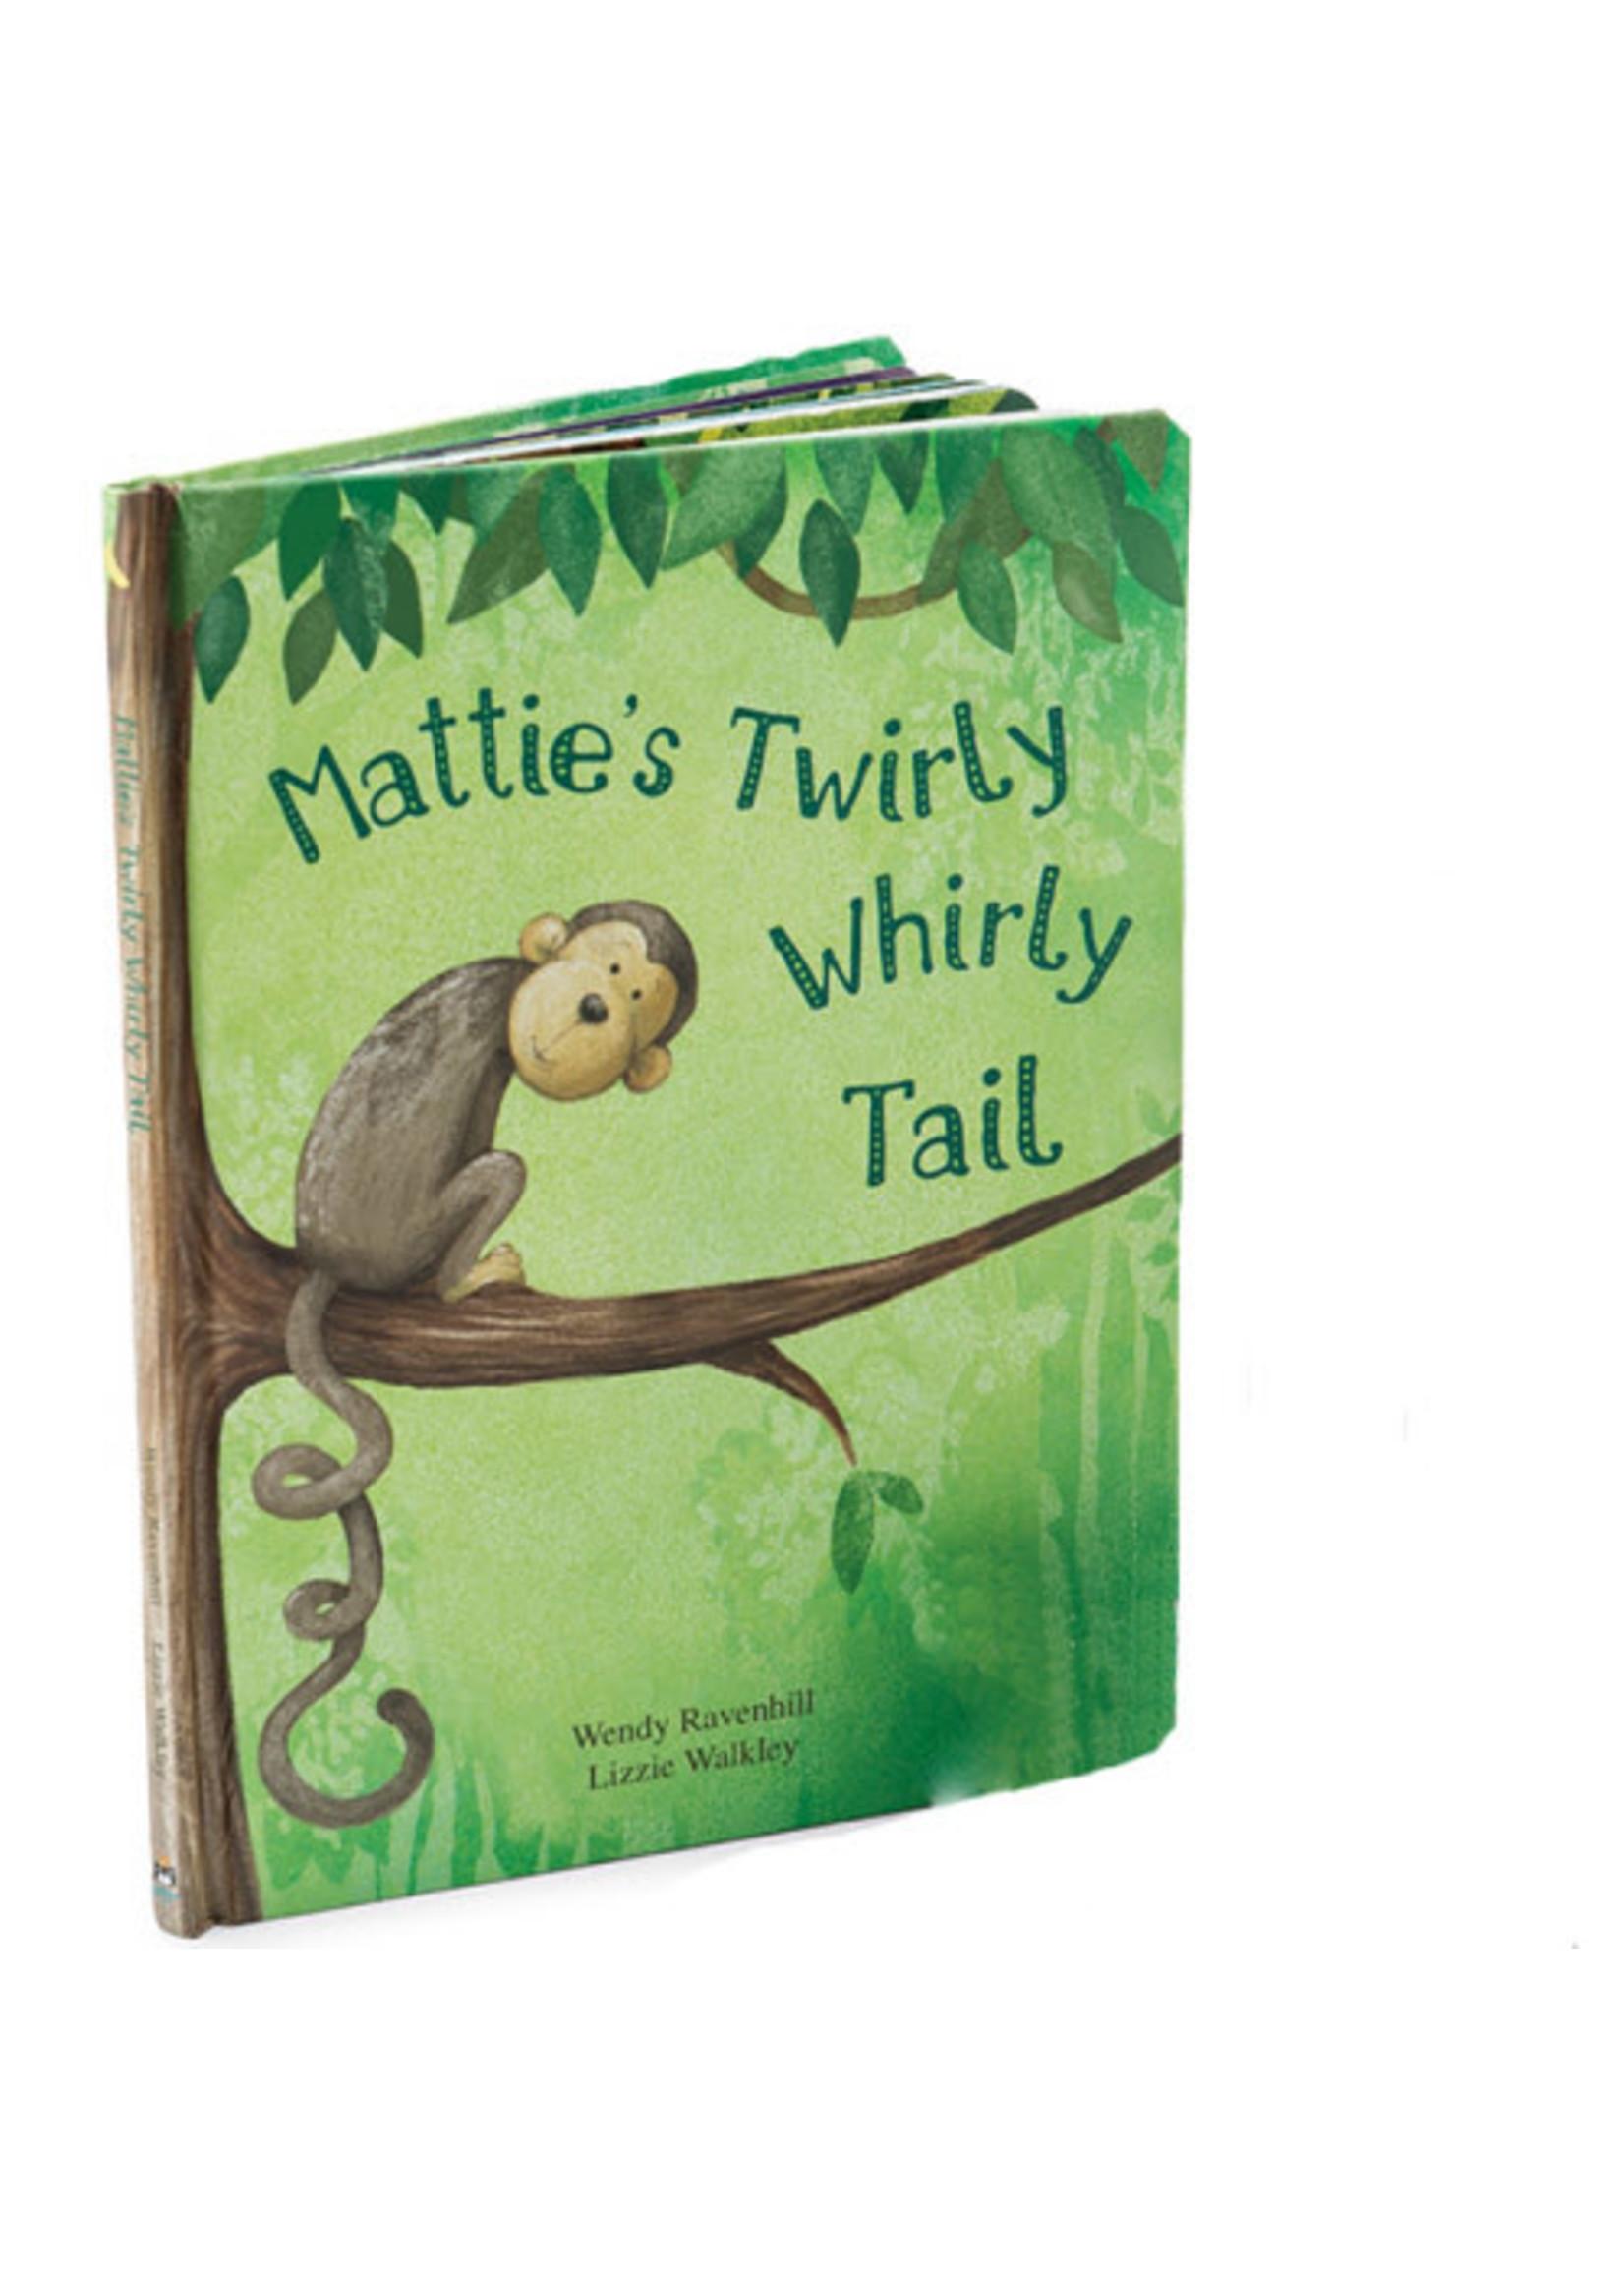 Jellycat JC Mattie's Twirly Whirl Tail Book